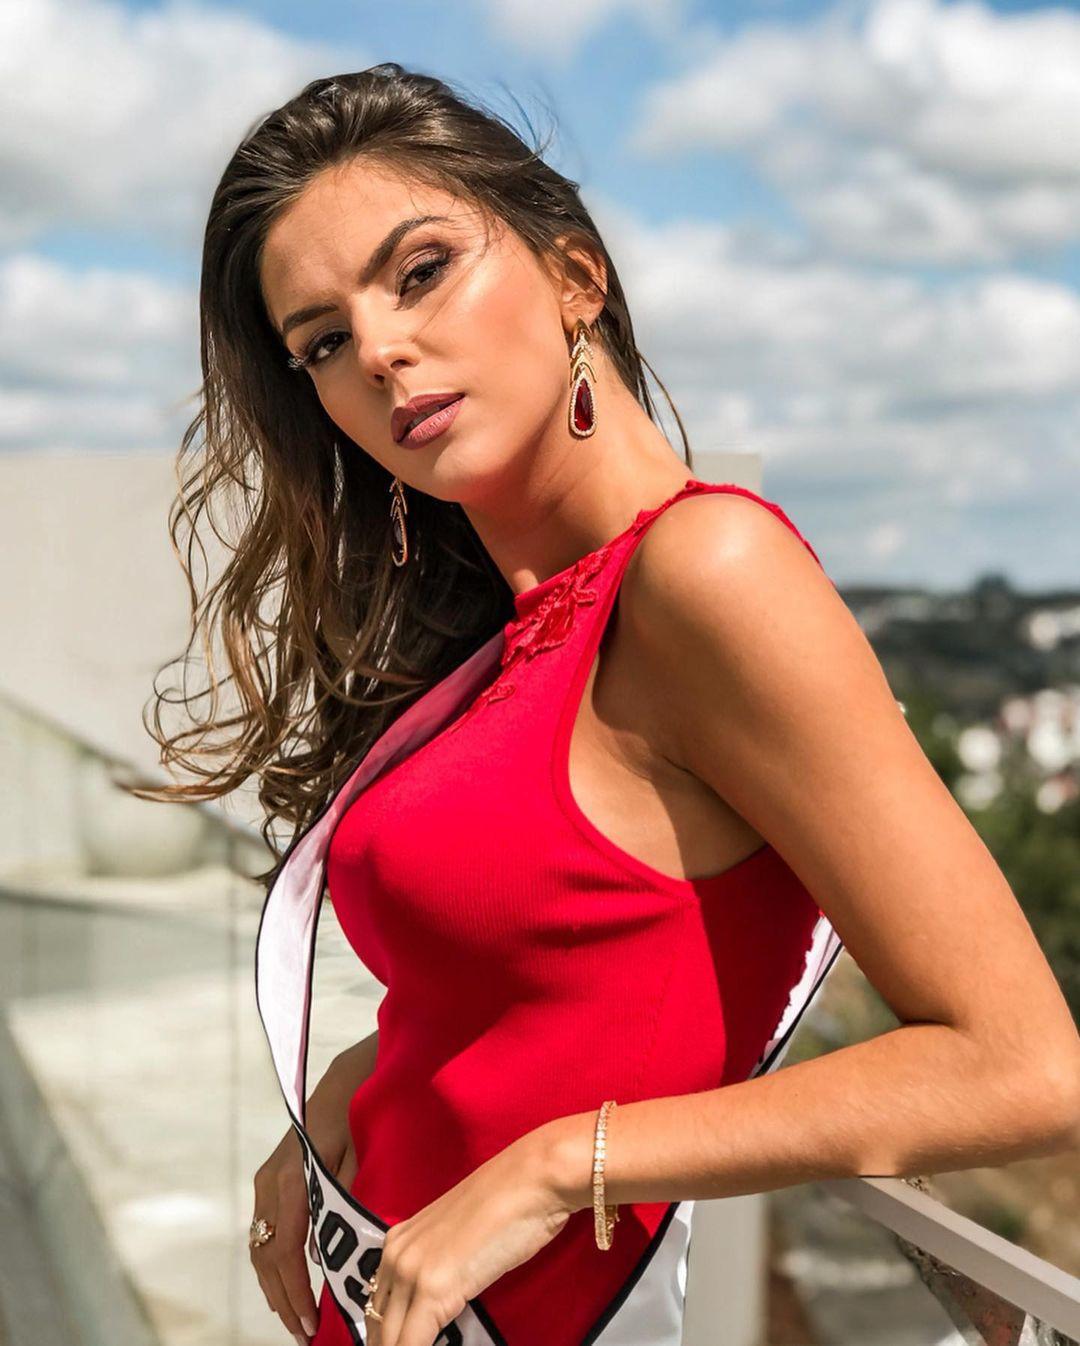 ana flavia giacomini, miss ilha dos lobos mundo 2019. - Página 8 Fwhhru10